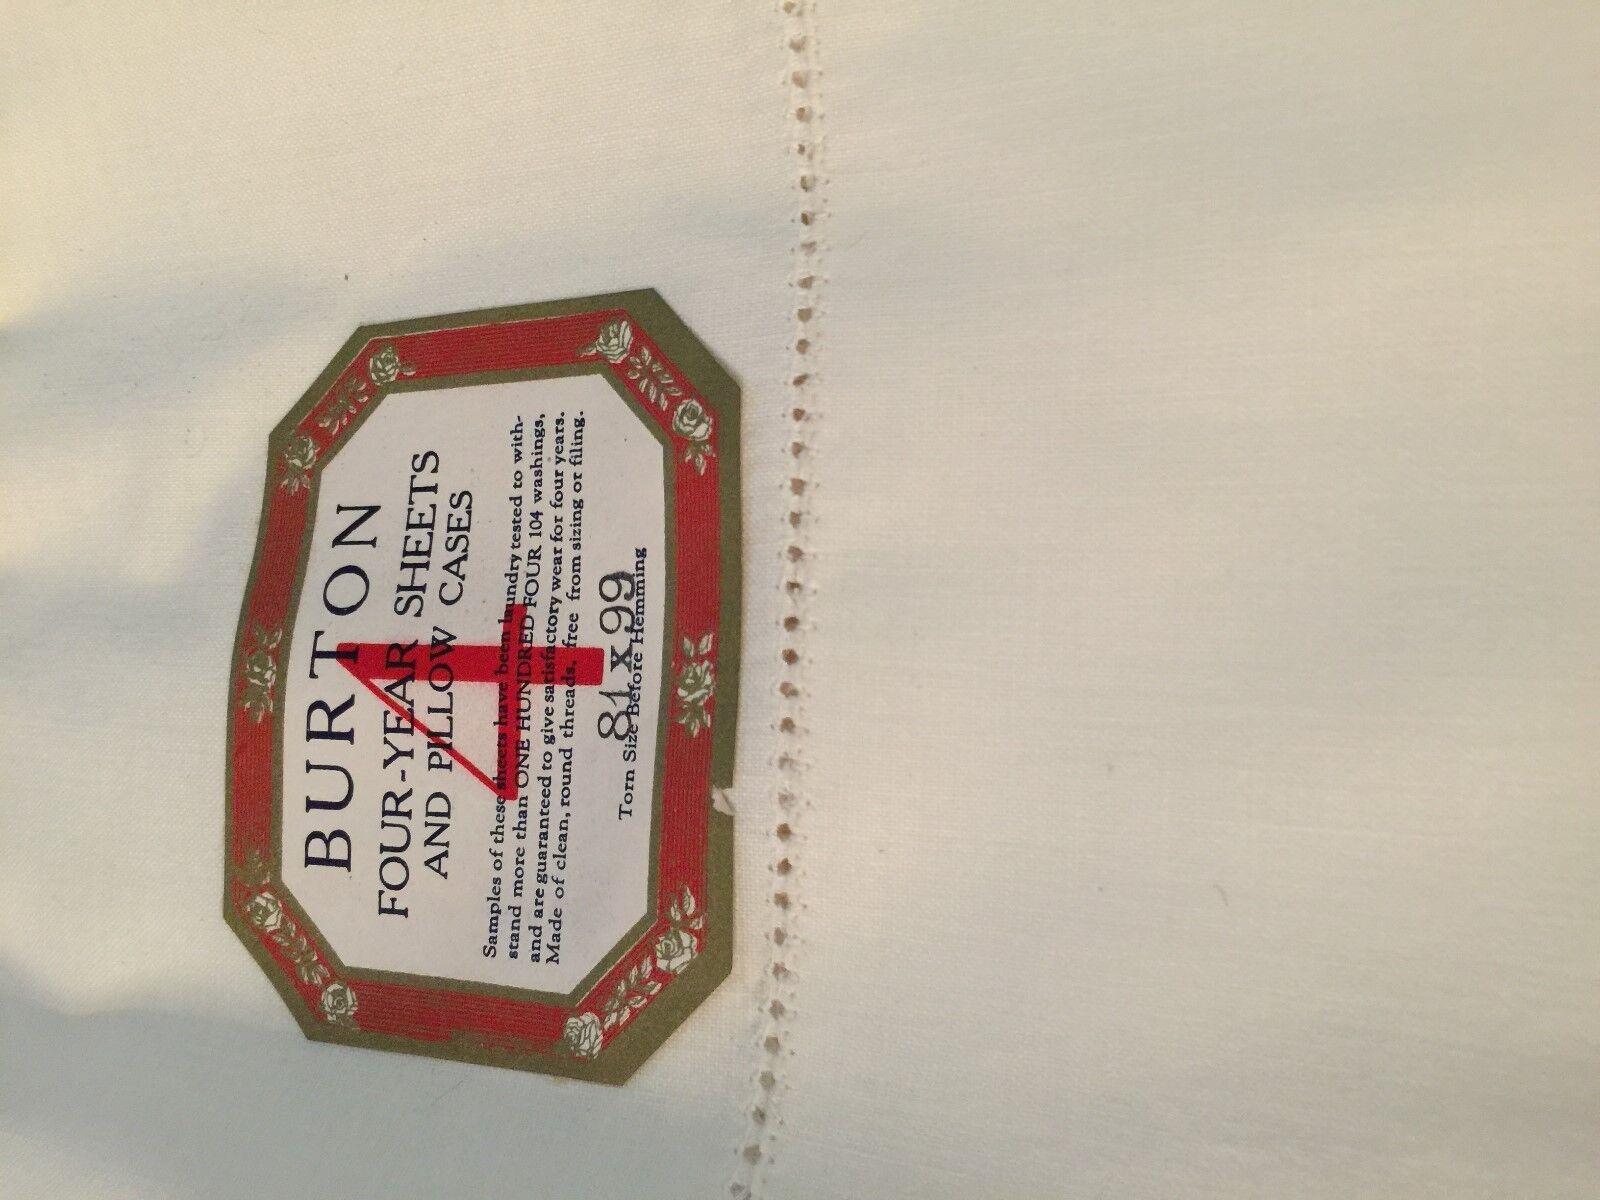 Grandmas Estate Vintage Estate Sheet (4074)